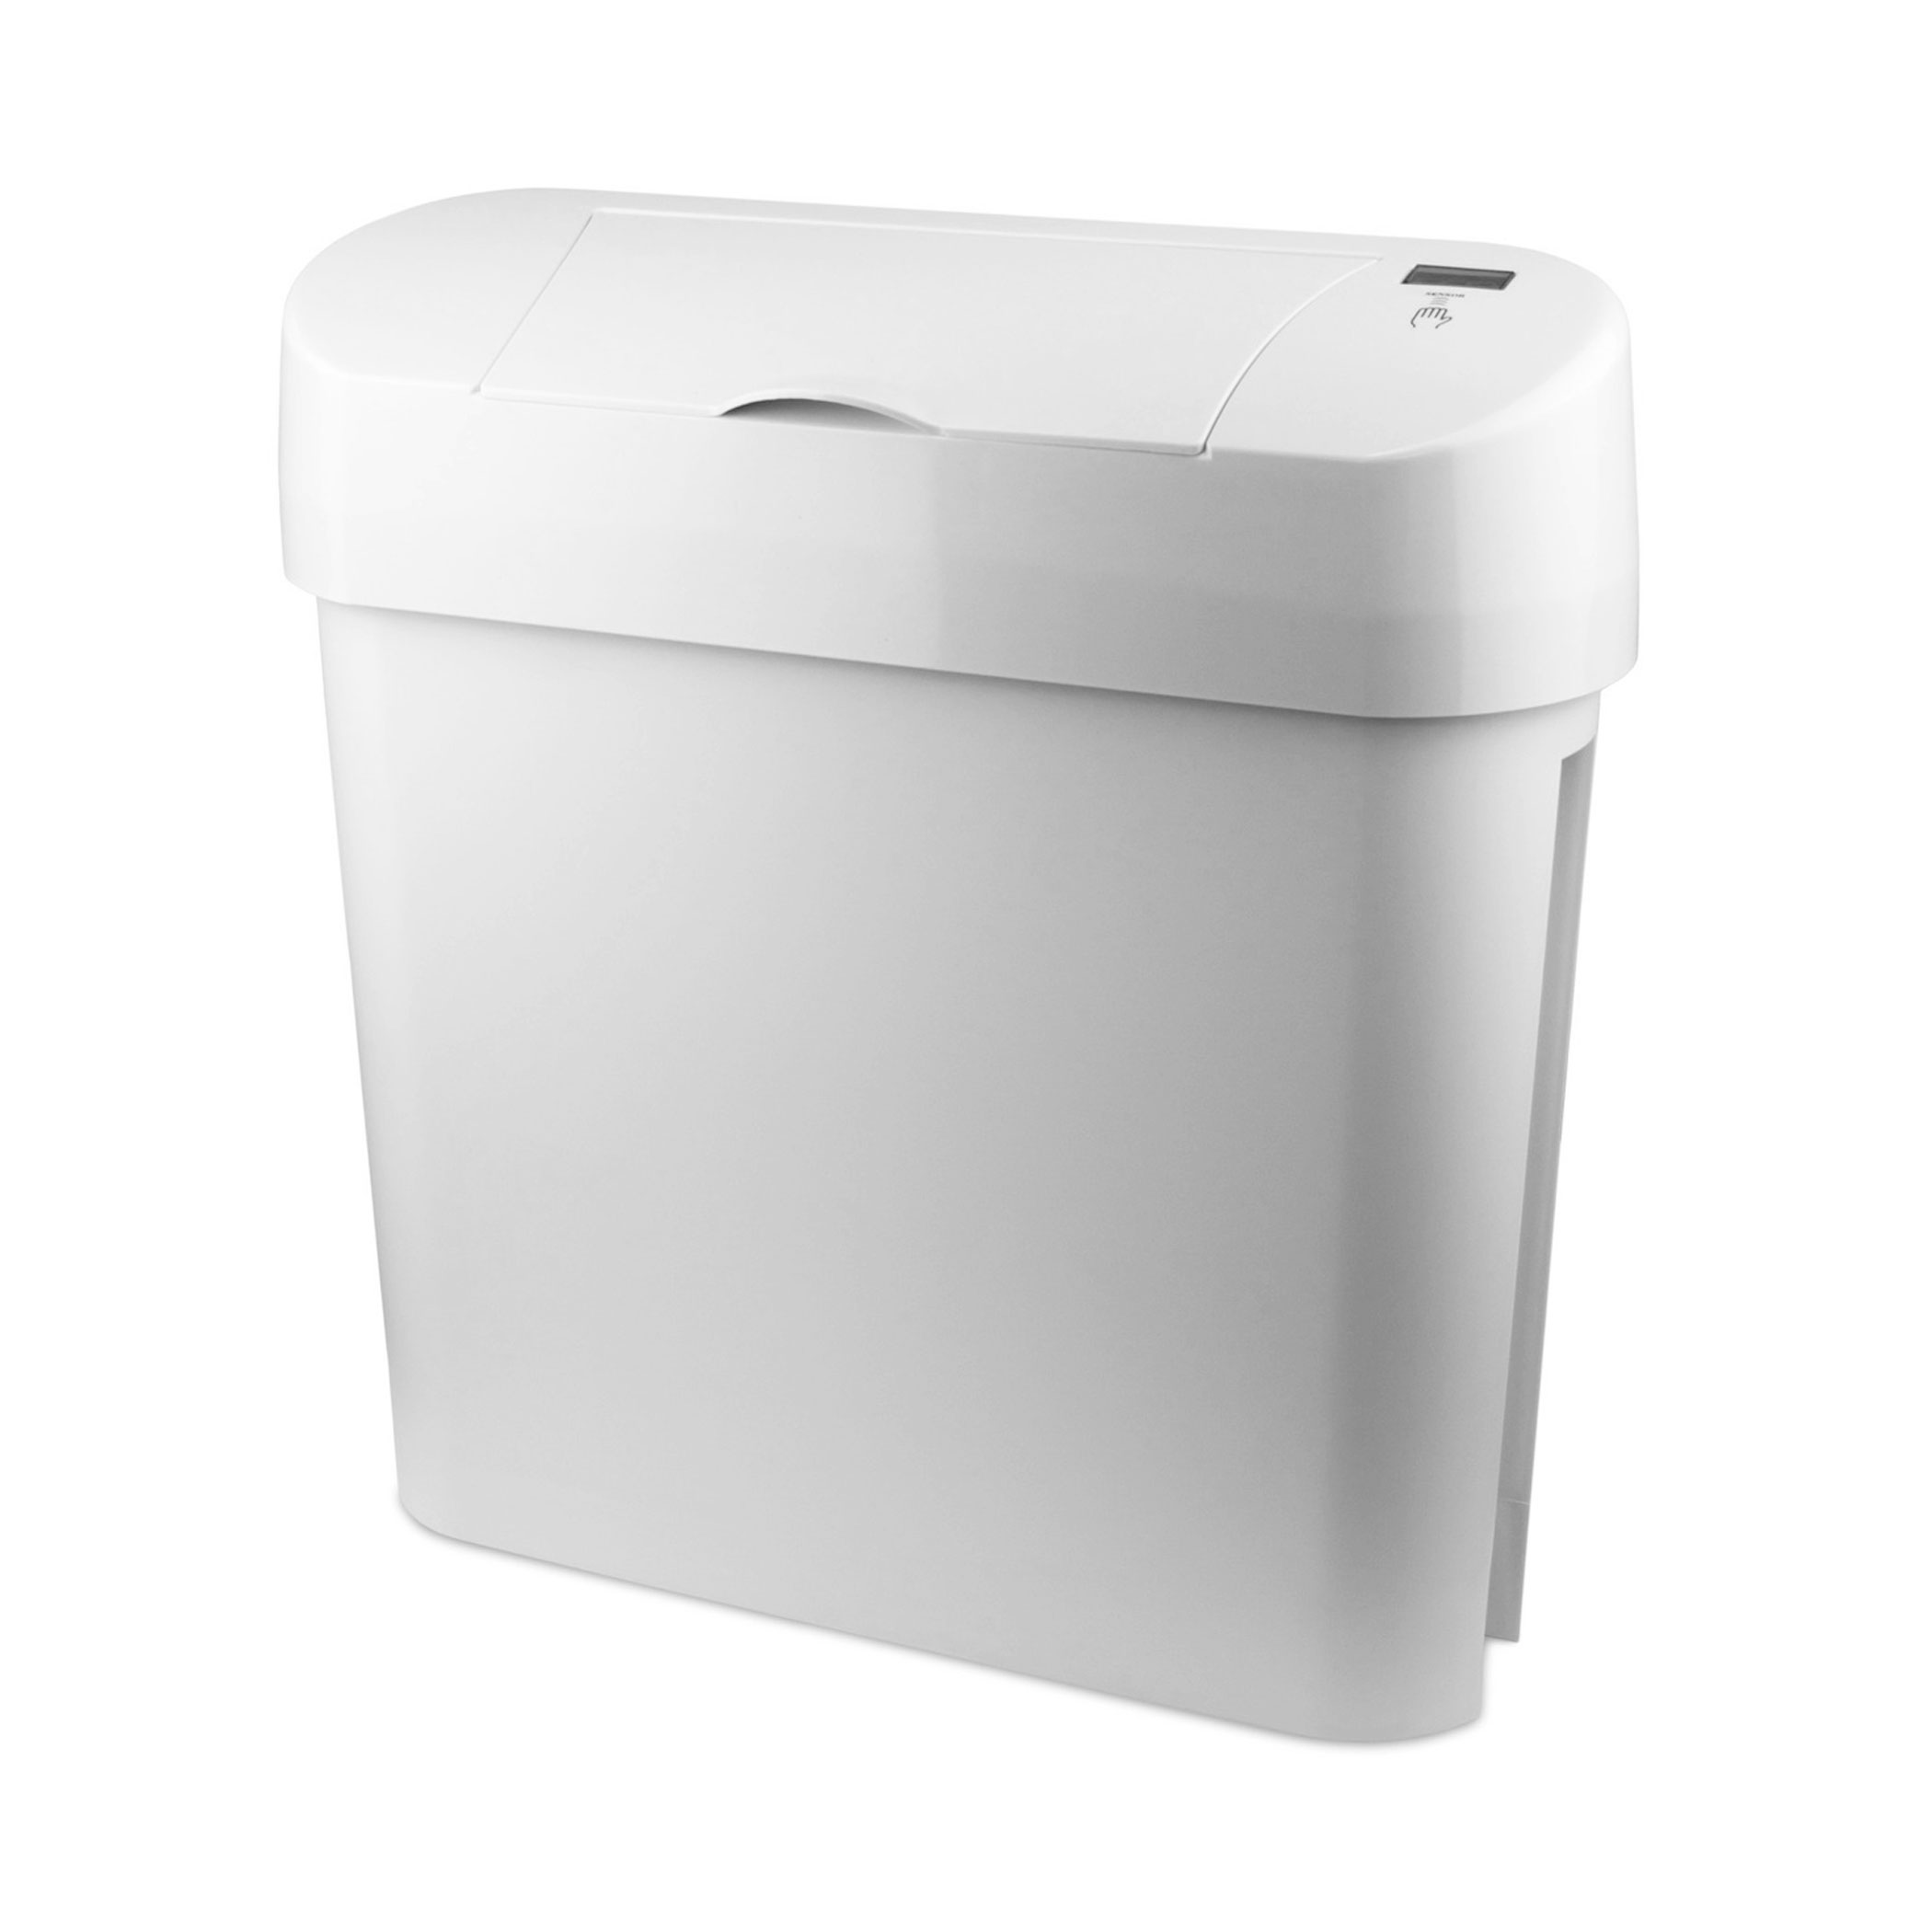 Automatic Sanitary Bin 15L white angle 72006W CD 7002A